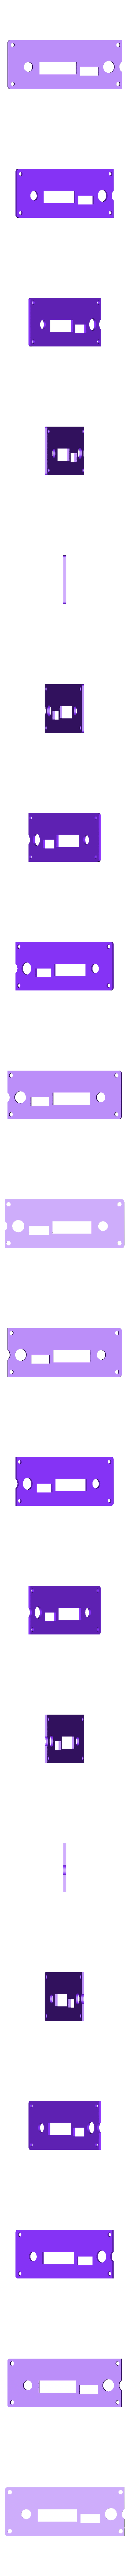 lcd1920x1200back-2.STL Download free STL file LCD controller case V29, V59 • 3D printer object, victor999